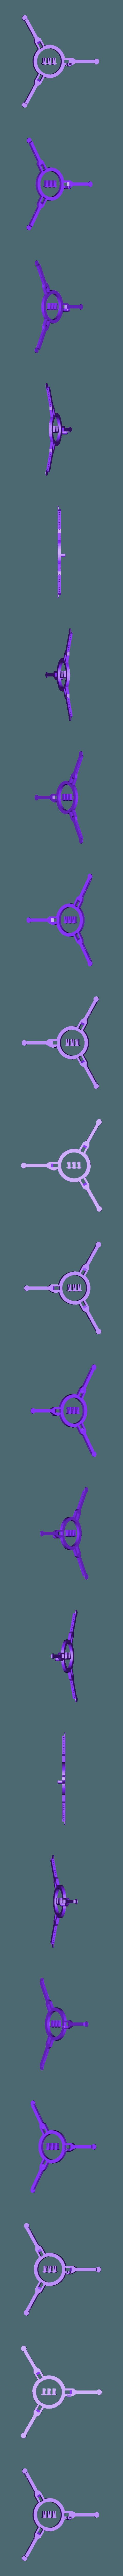 Part2+pins_MasterSpoolPlexiwire100Meters.stl Download free STL file Little Master Spool remix for Plexiwire 100 meters • 3D printer model, Az3Dip